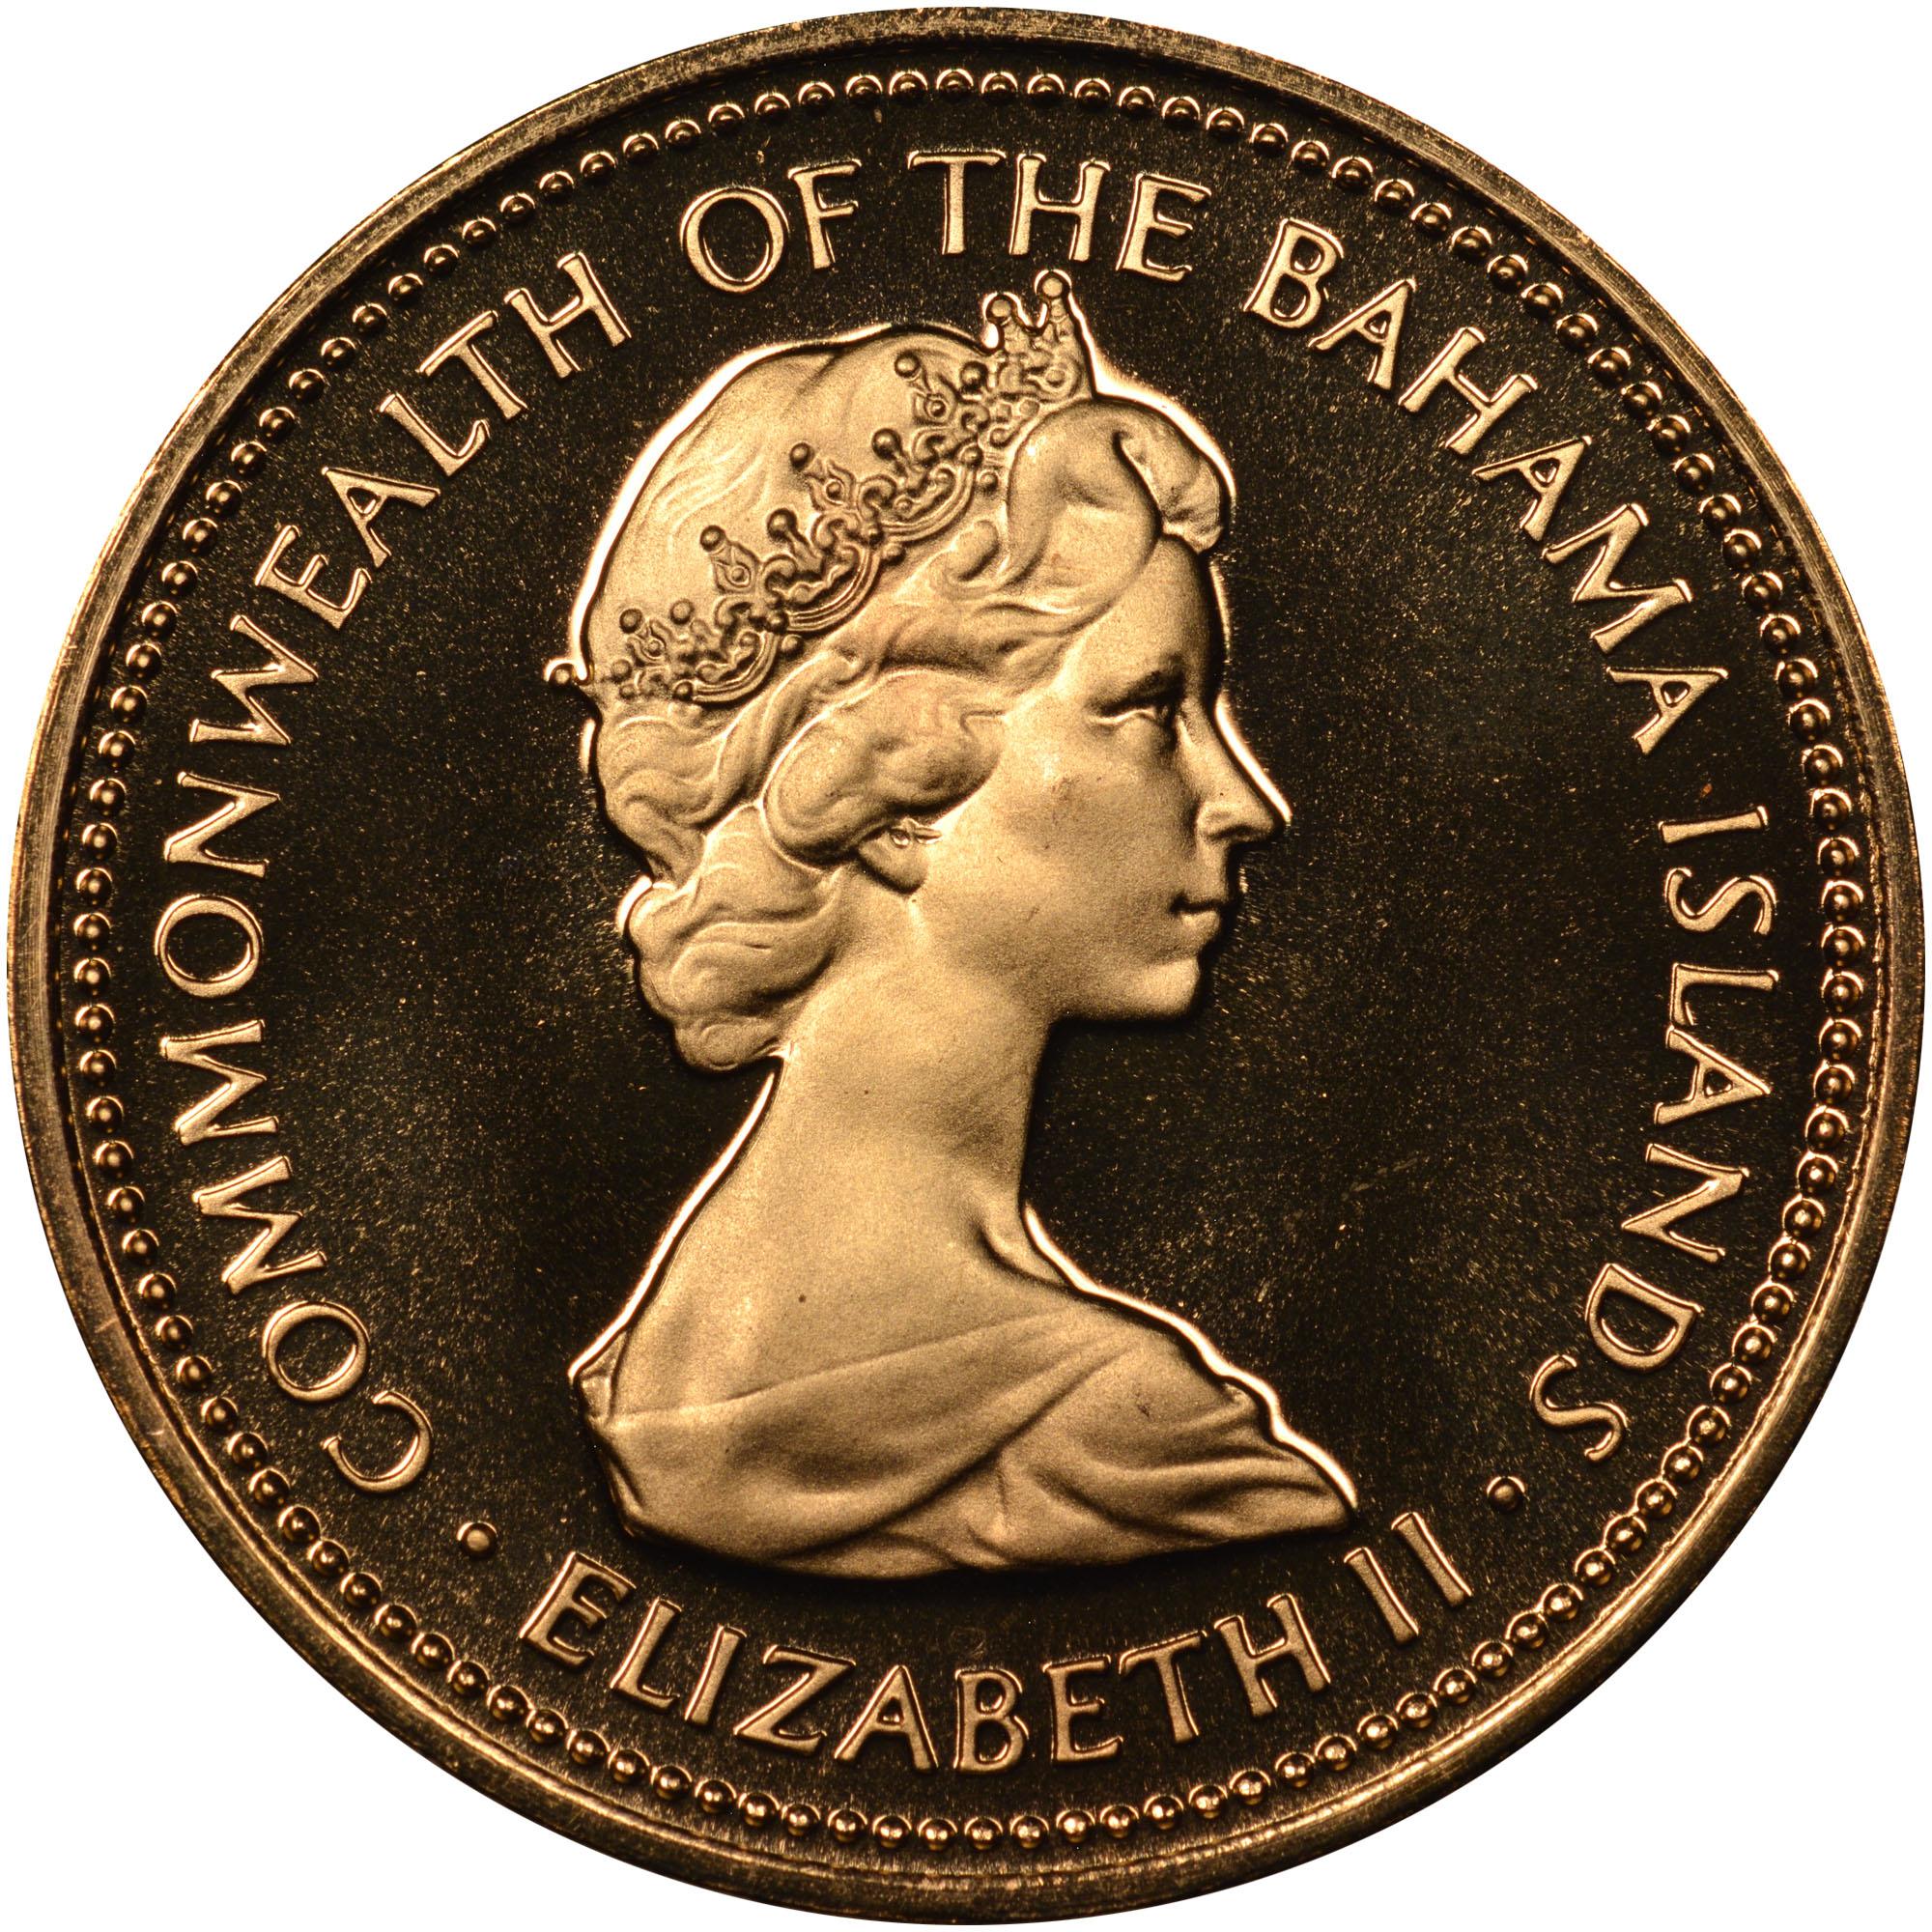 1971-1973 Bahamas Cent obverse